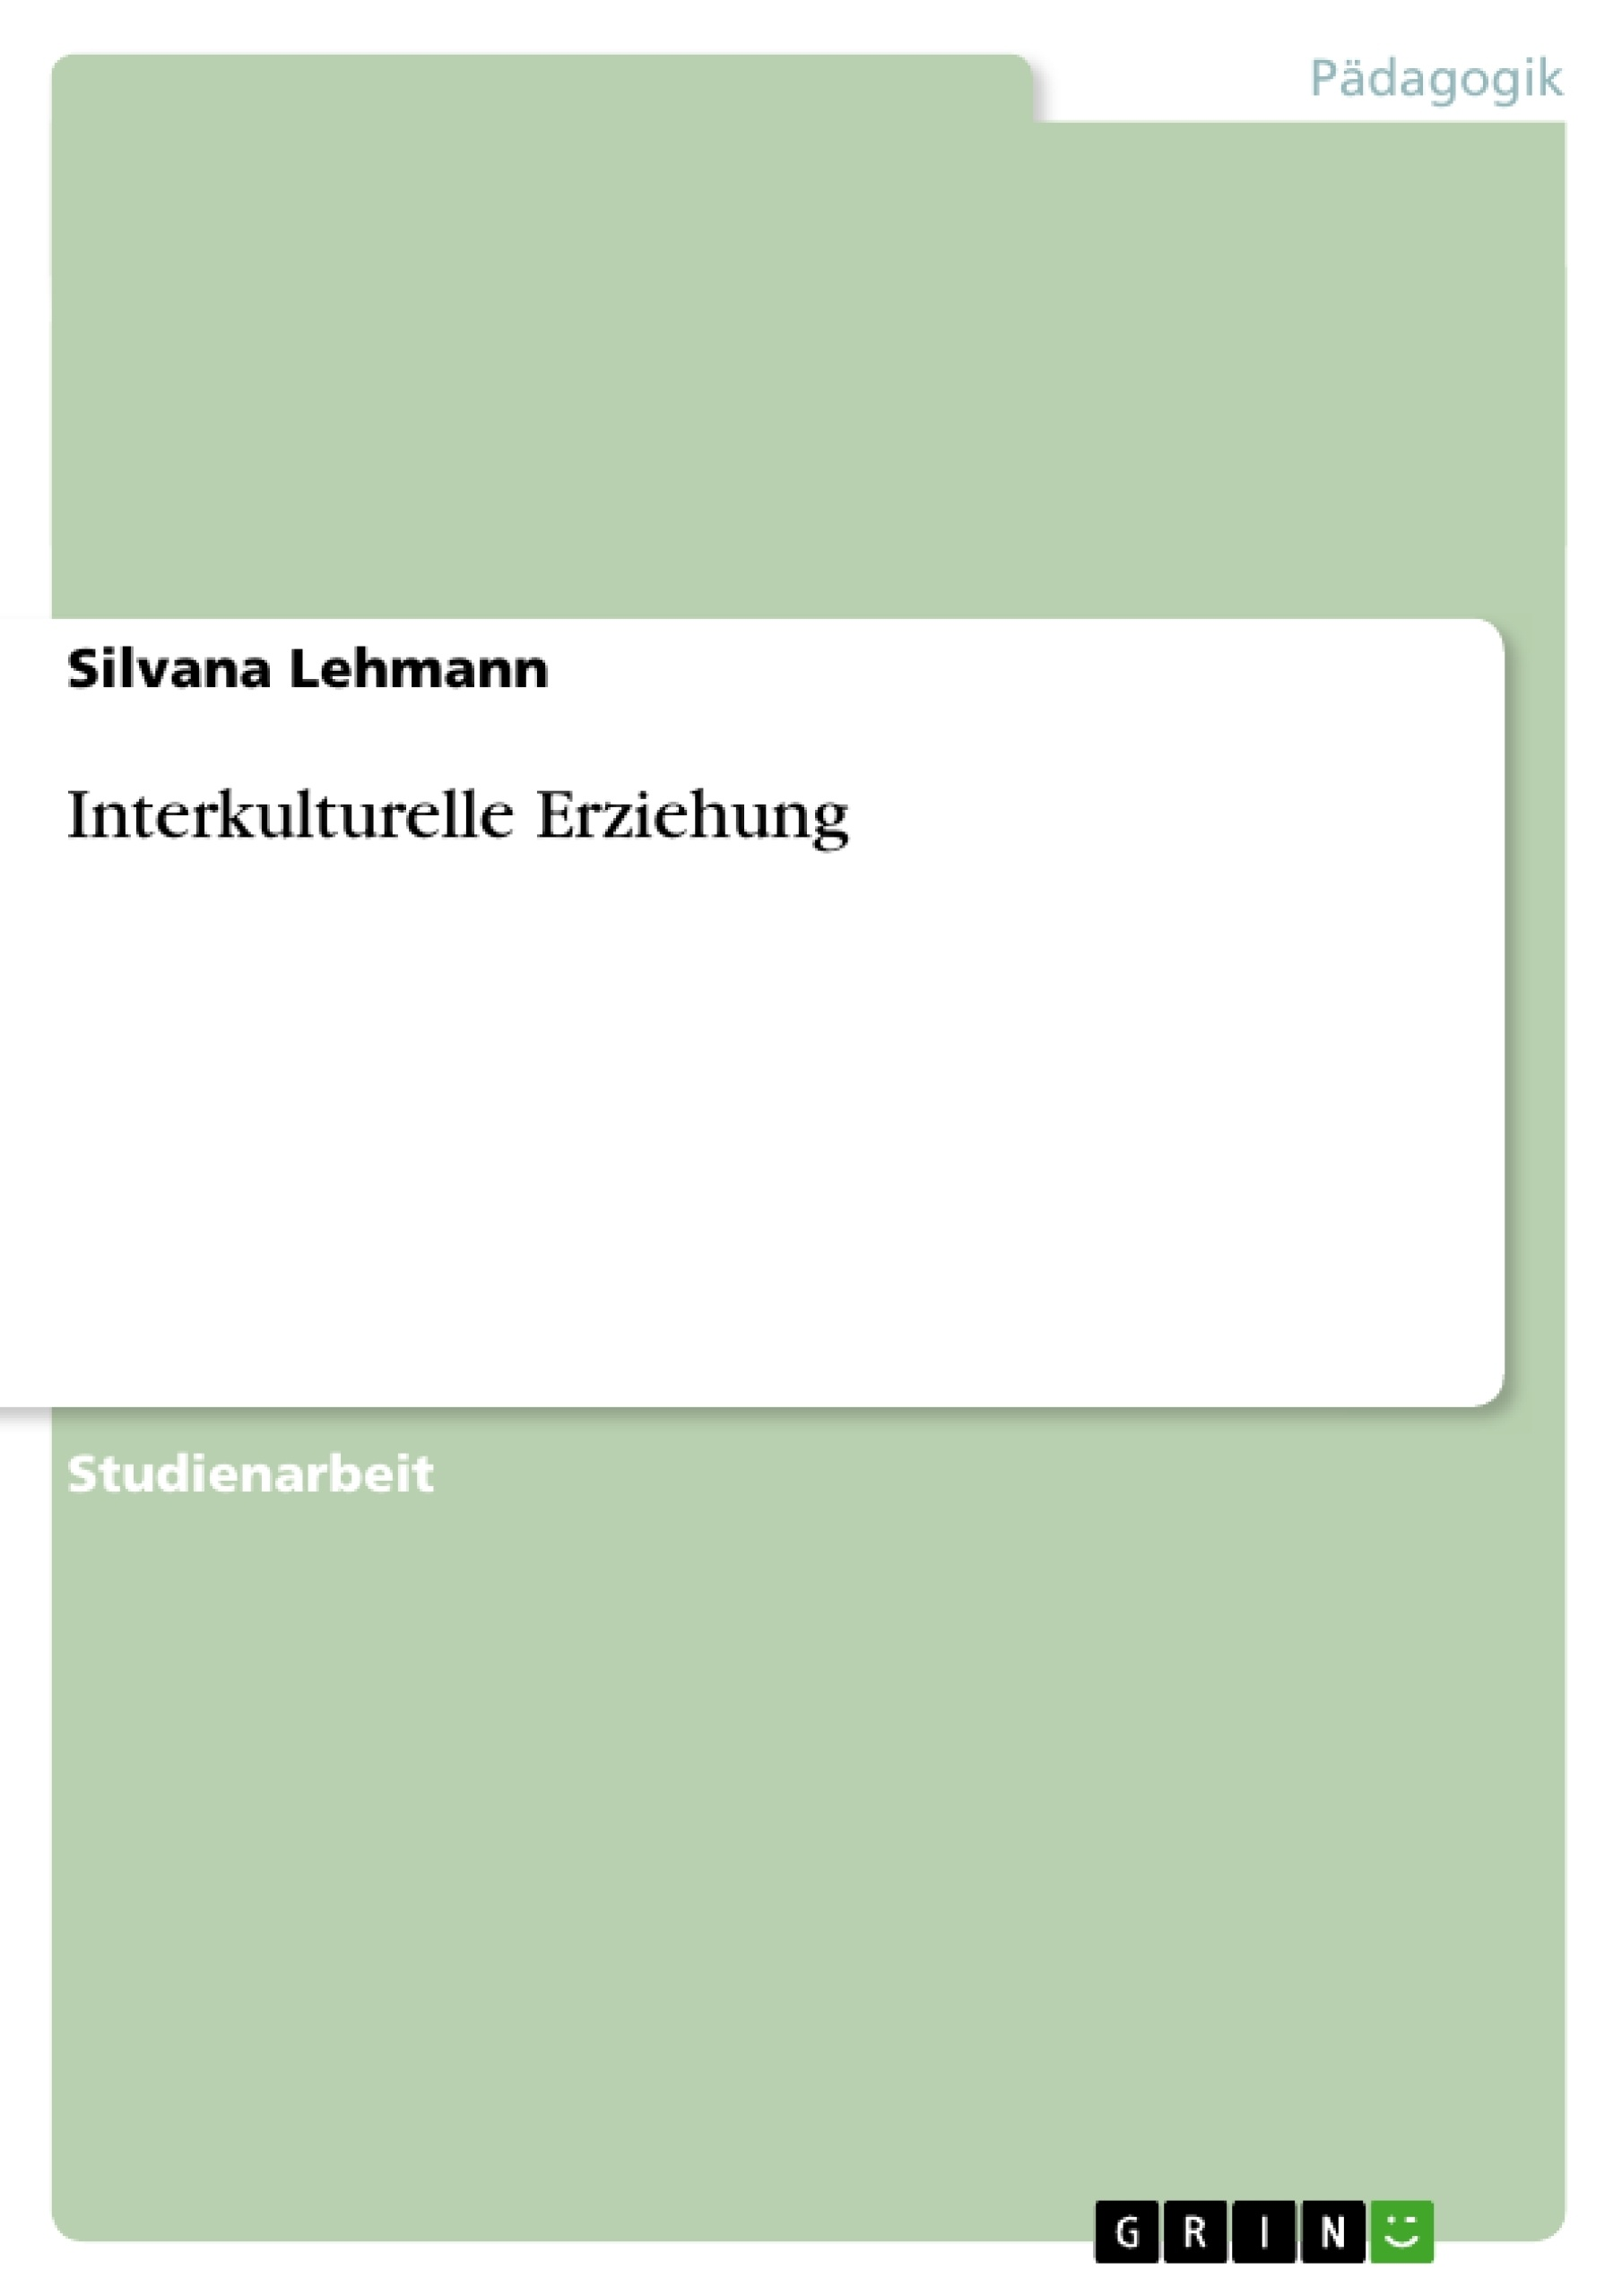 Titel: Interkulturelle Erziehung